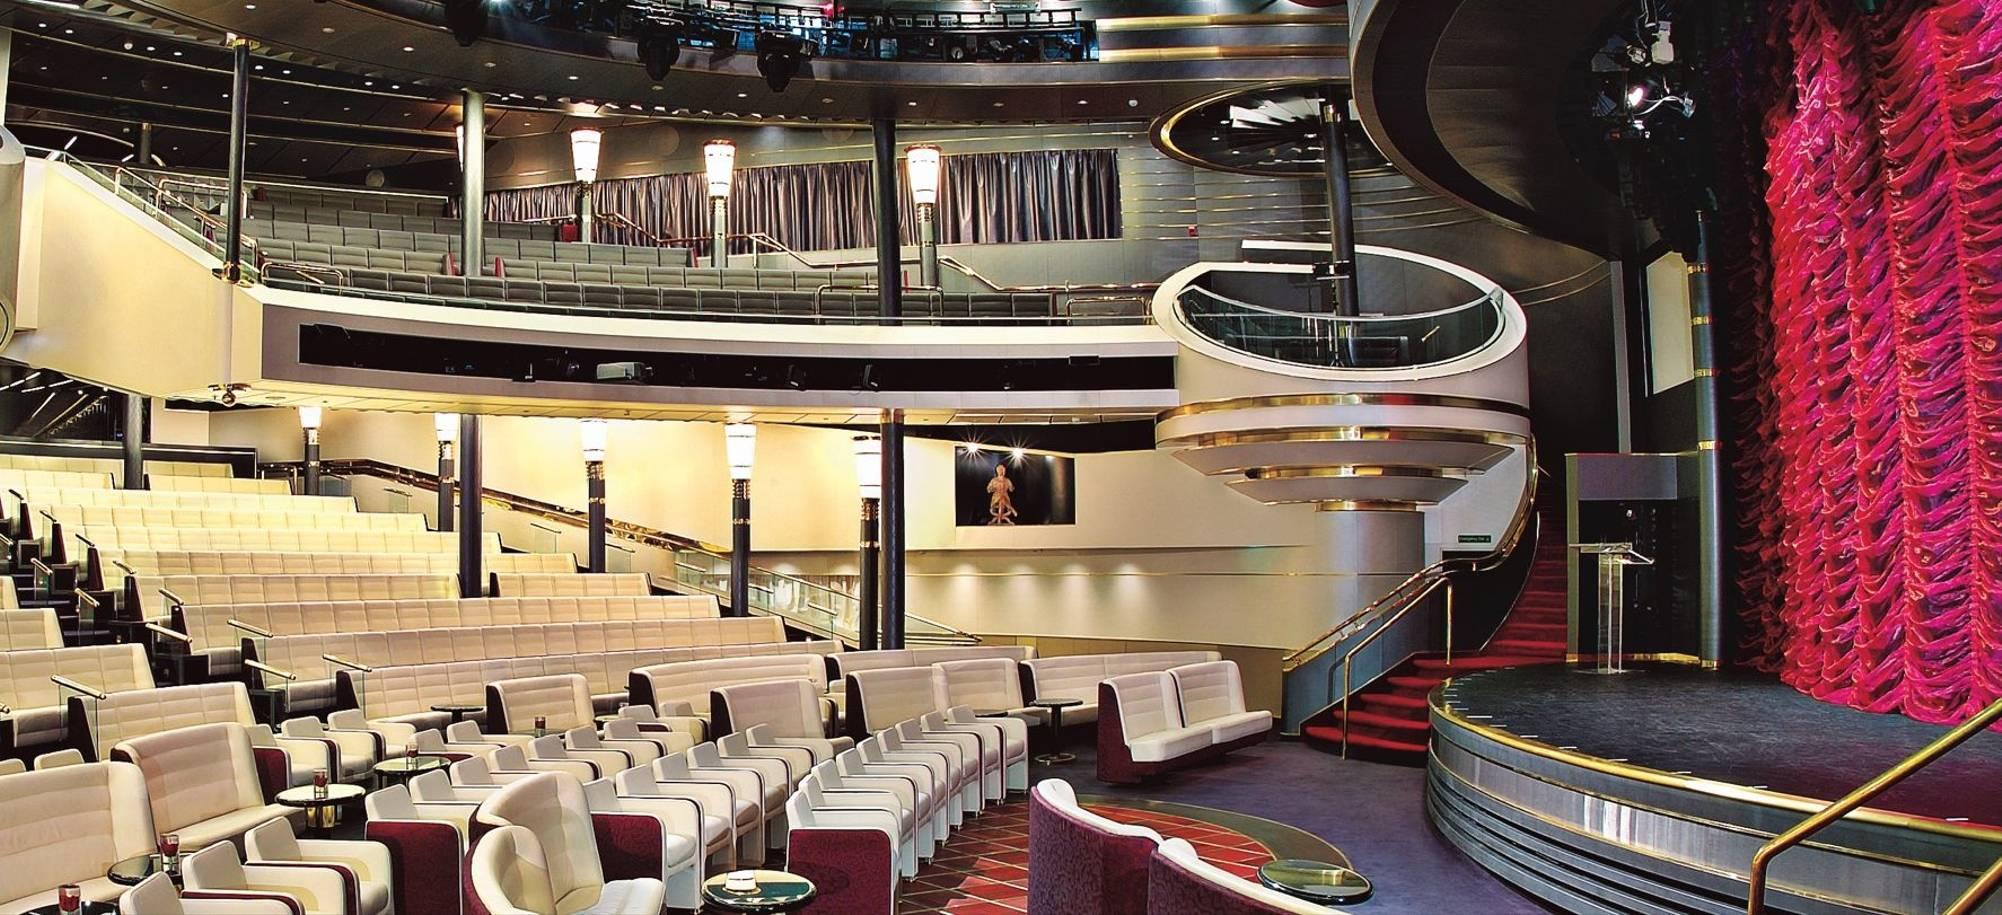 5 Day - At sea, Vista Lounge - Itinerary Desktop.jpg